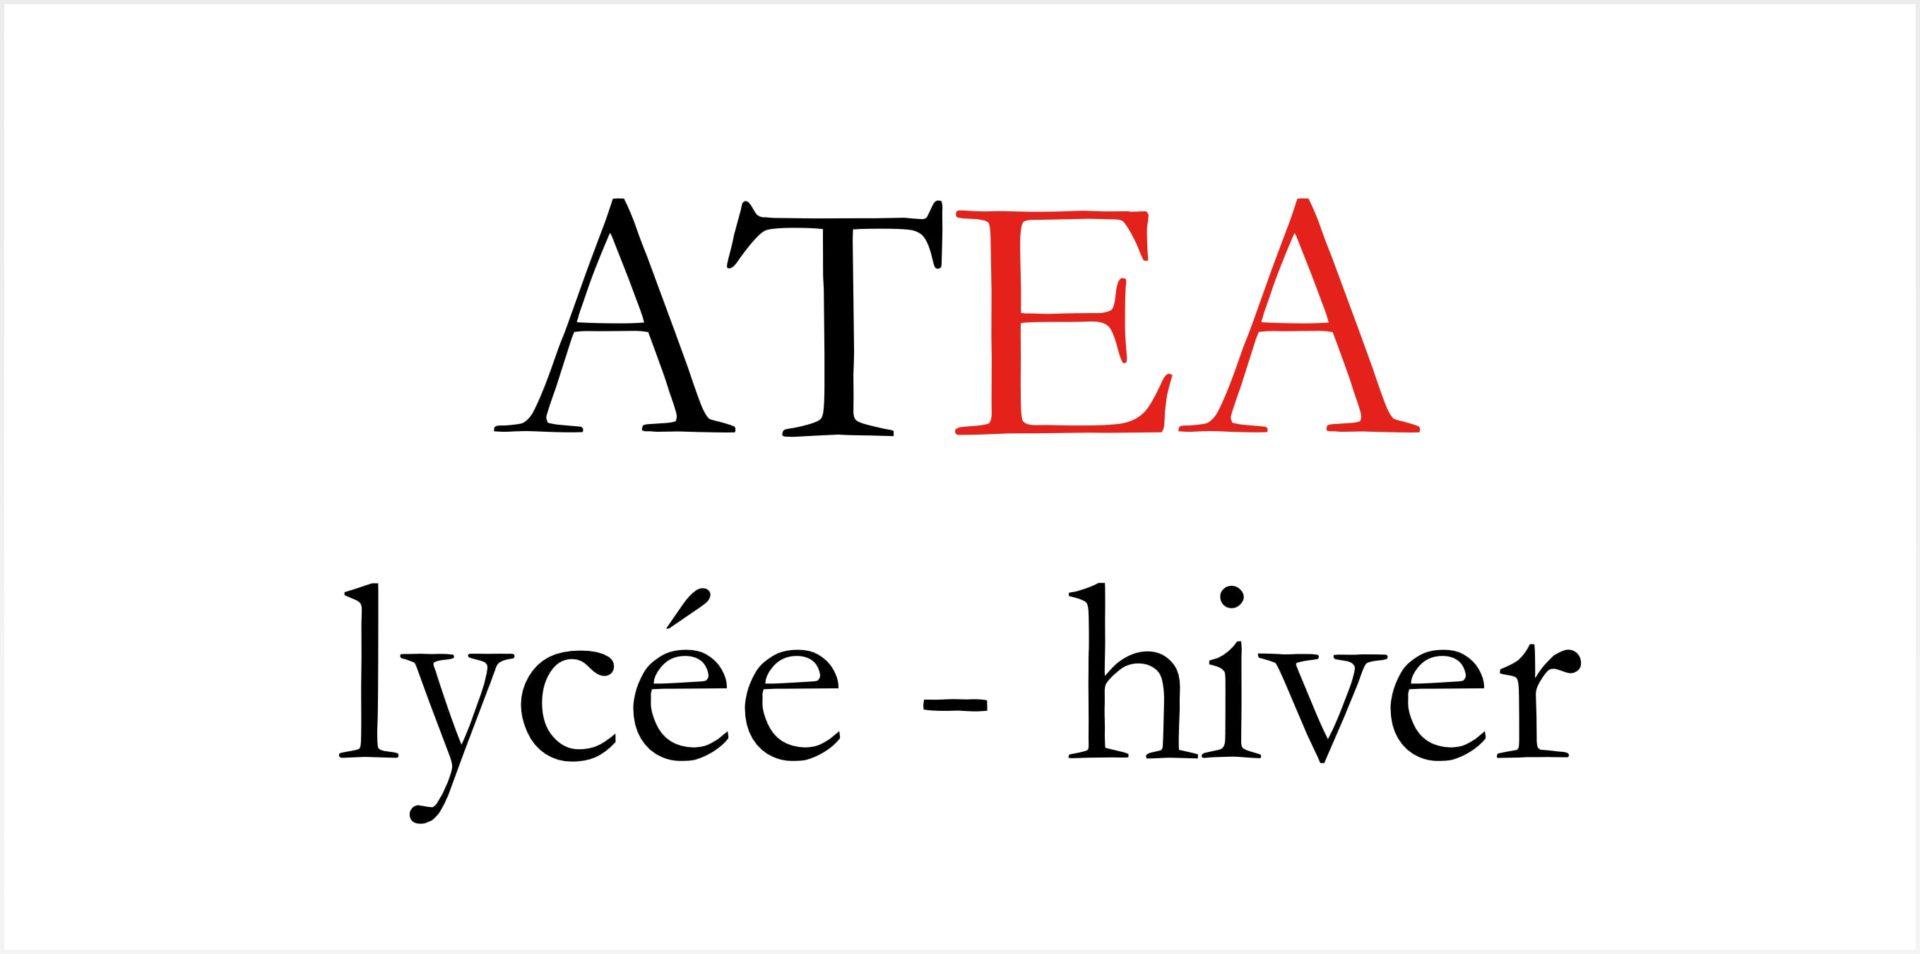 ATEA Lycée Hiver